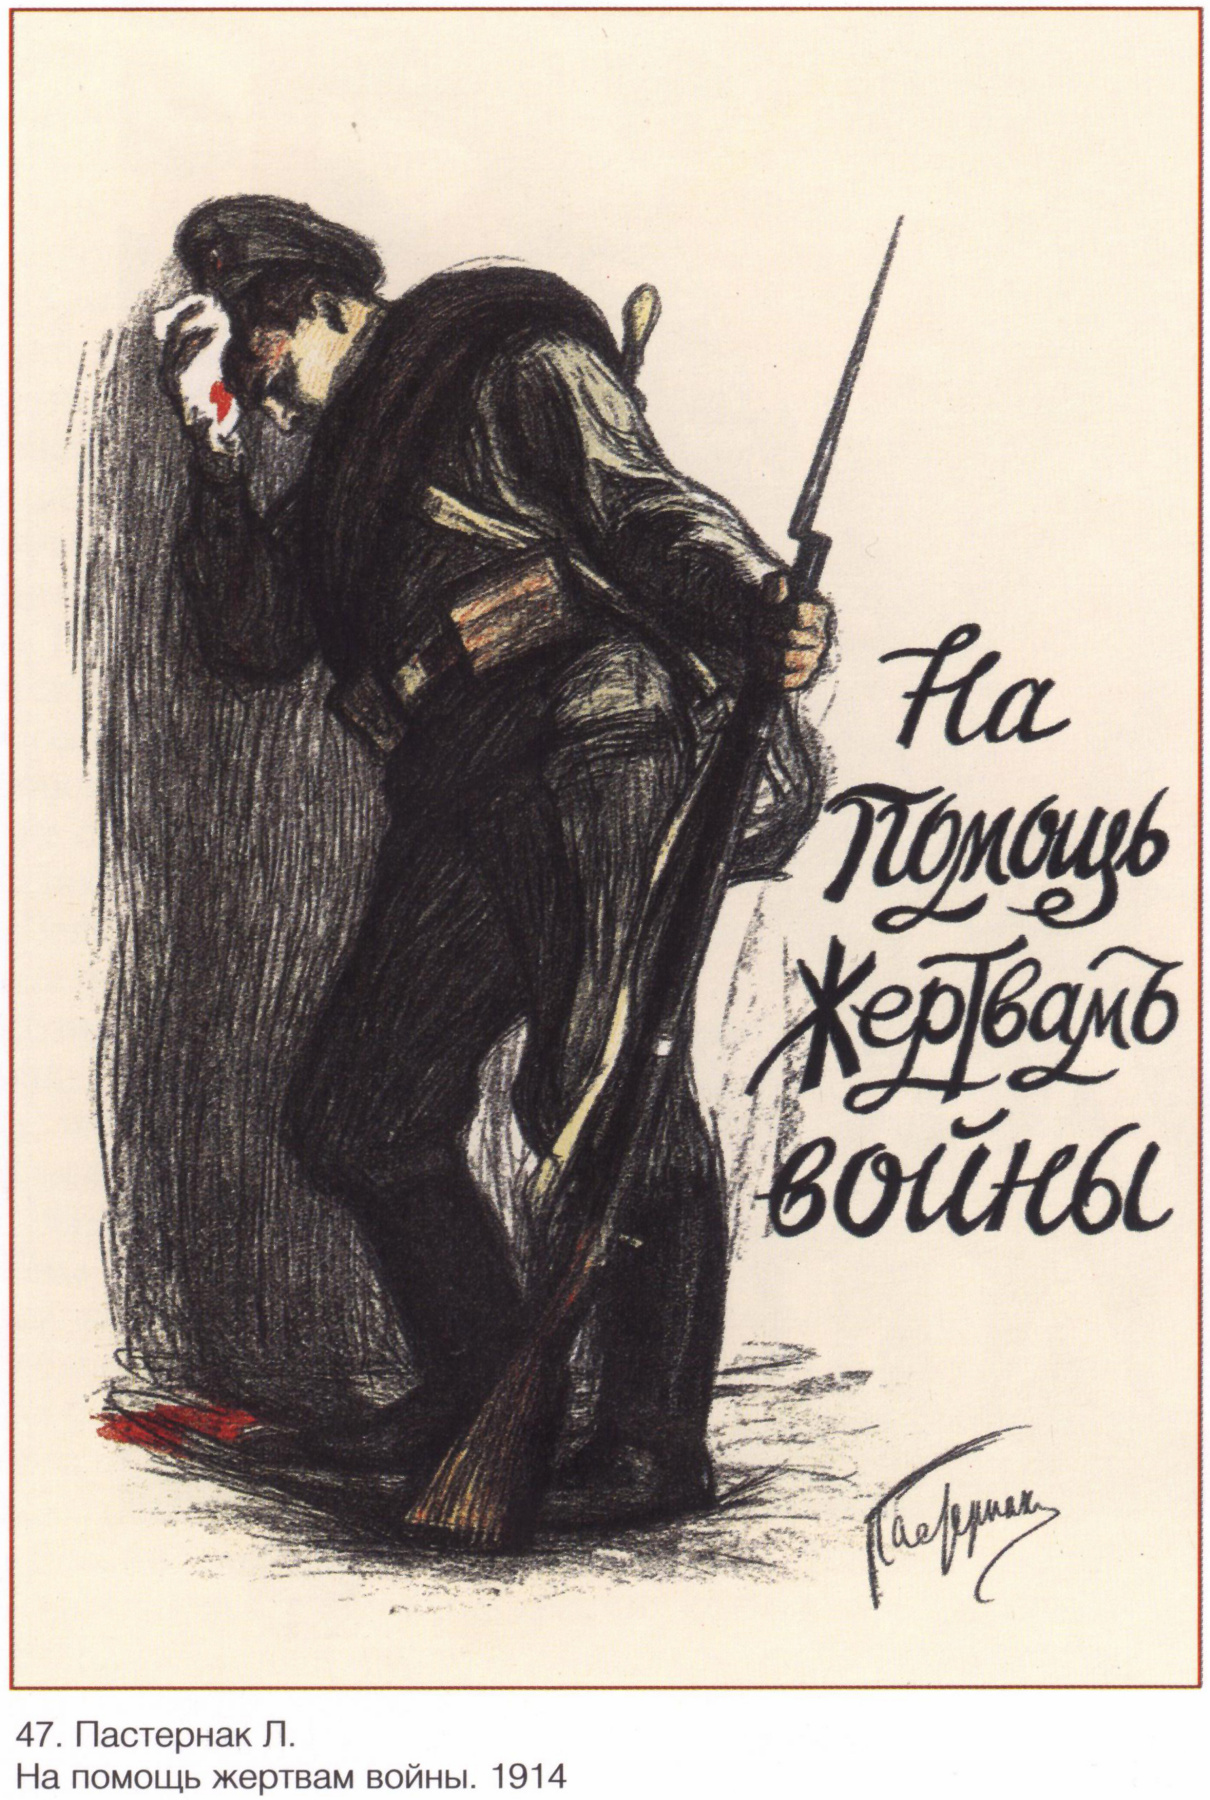 Жертвам войны. открытка